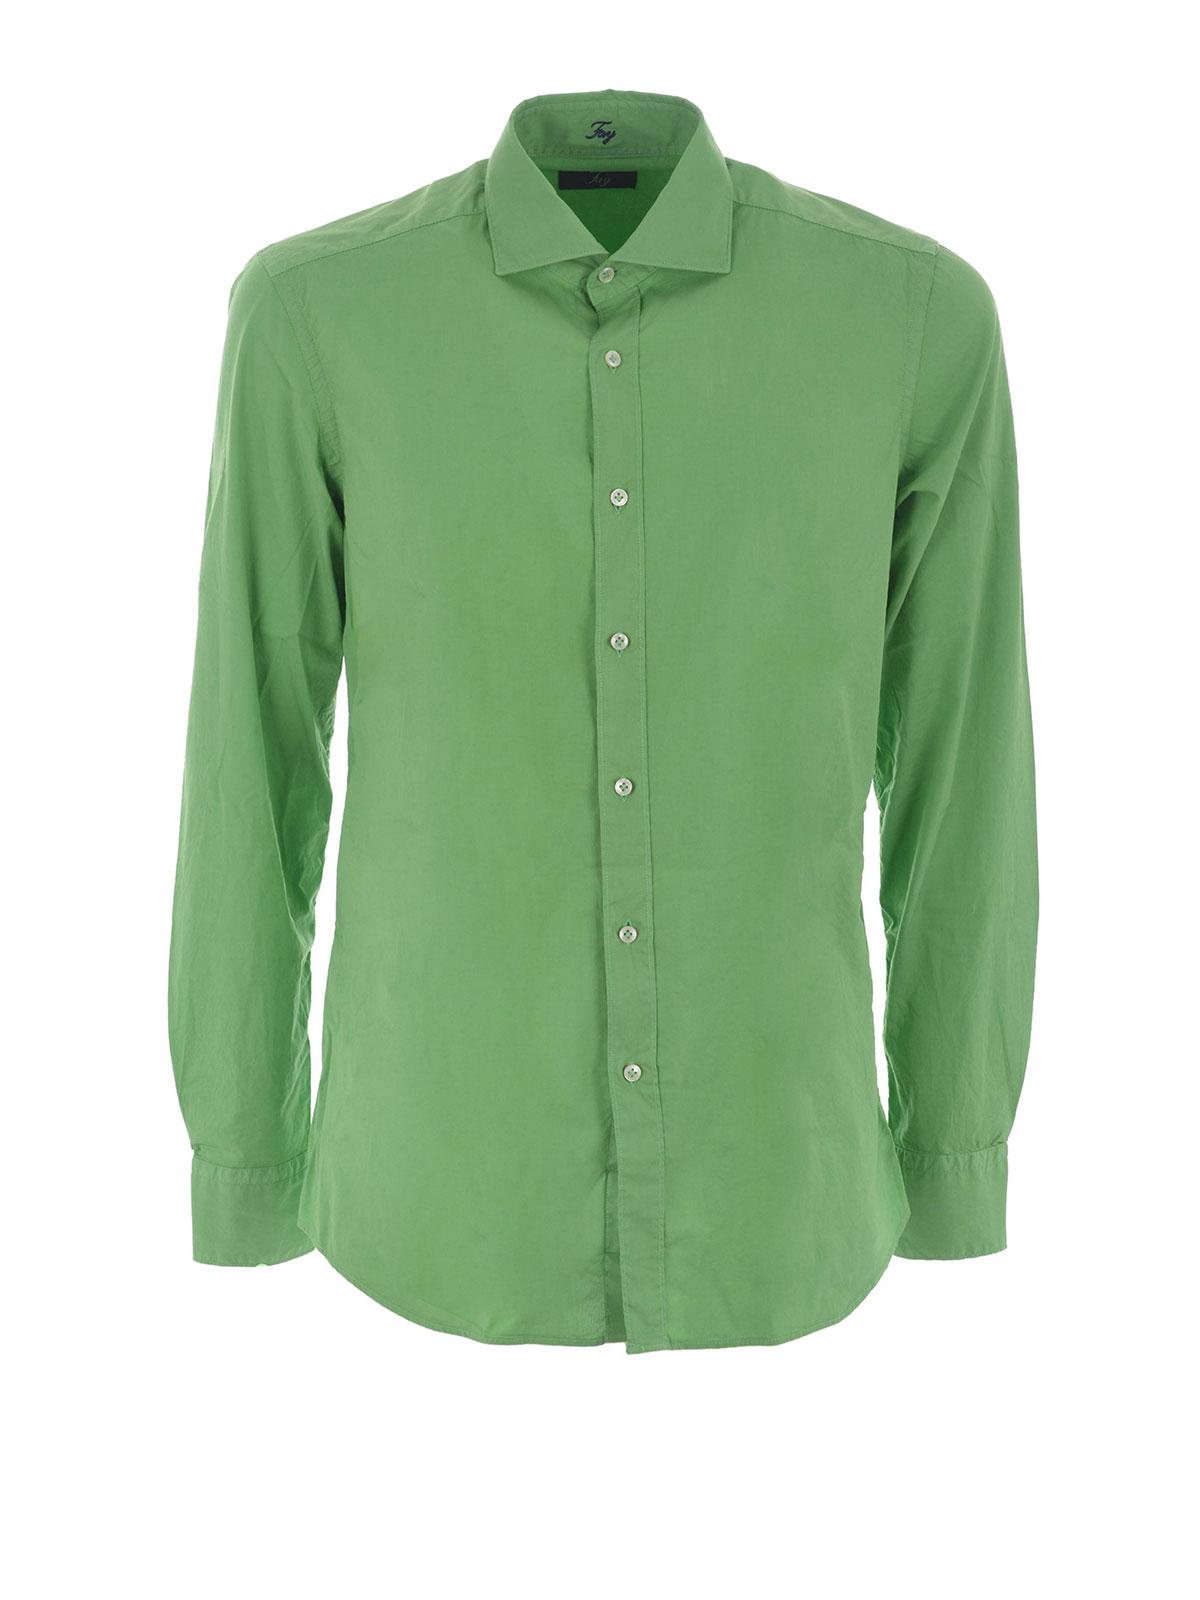 Stretch poplin cotton shirt by fay shirts ikrix for What is a poplin shirt